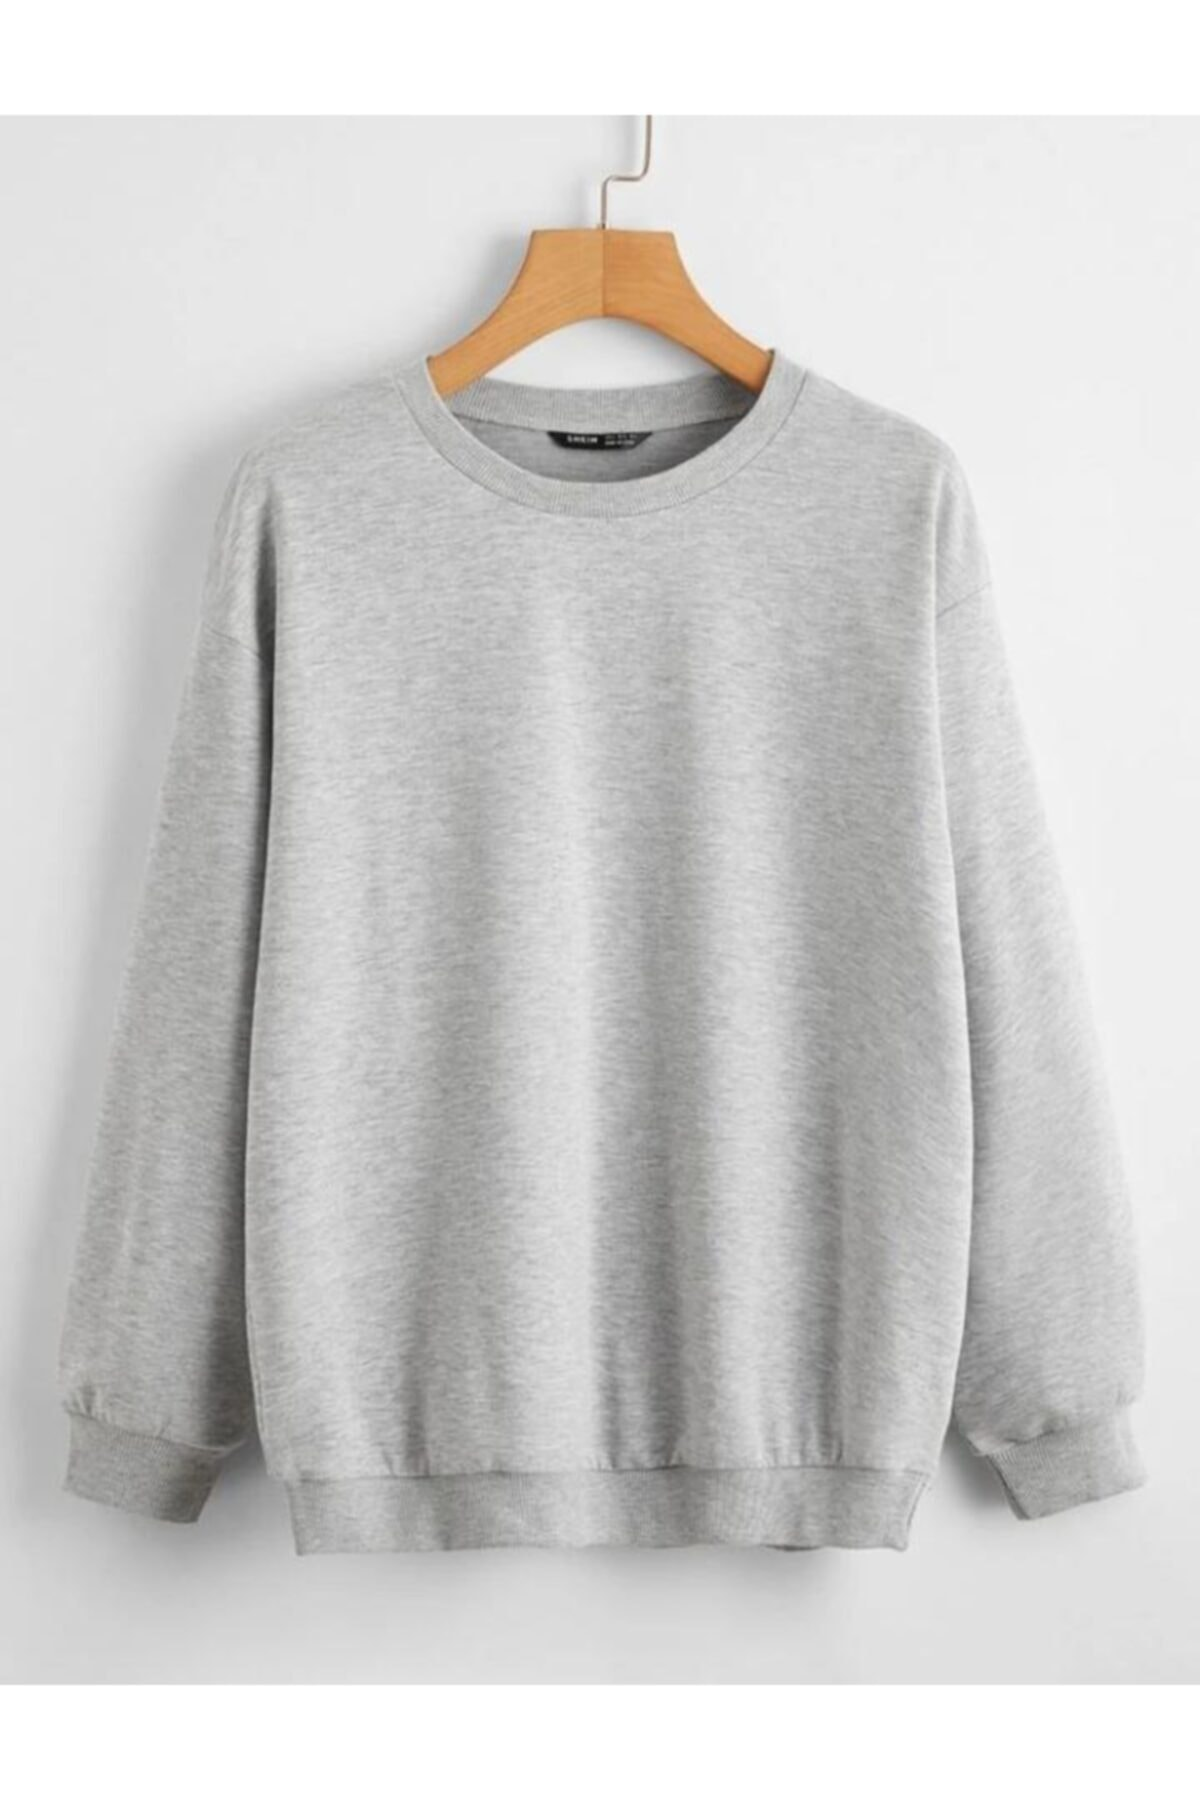 cartoonsshop Unisex Gri Düz Basic Sweatshirt 1